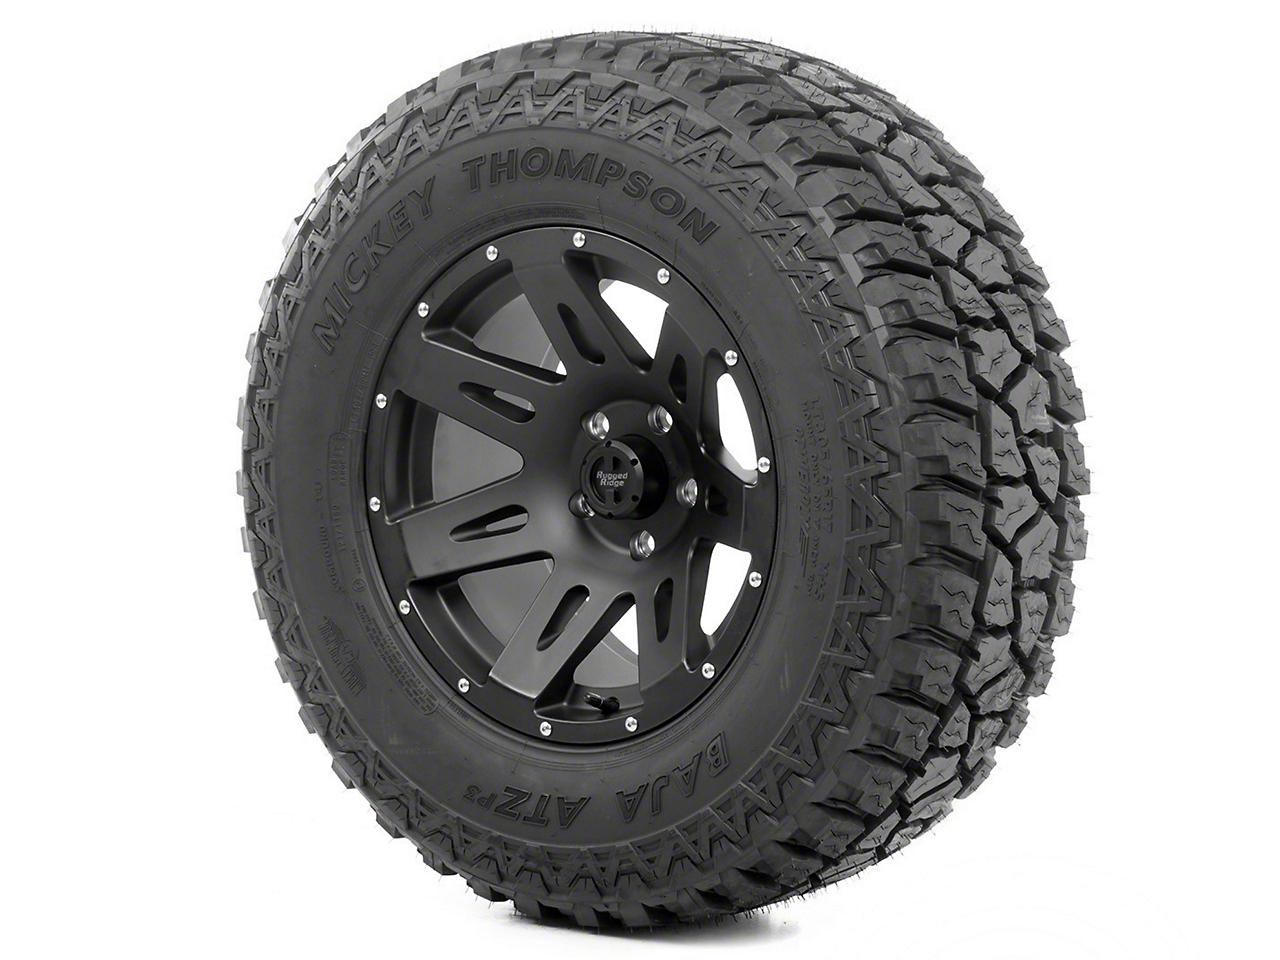 Rugged Ridge XHD Wheel 18x9 Black Satin and Mickey Thompson ATZ P3 305/60R18 Wheel - Tire (13-17 Wrangler JK)